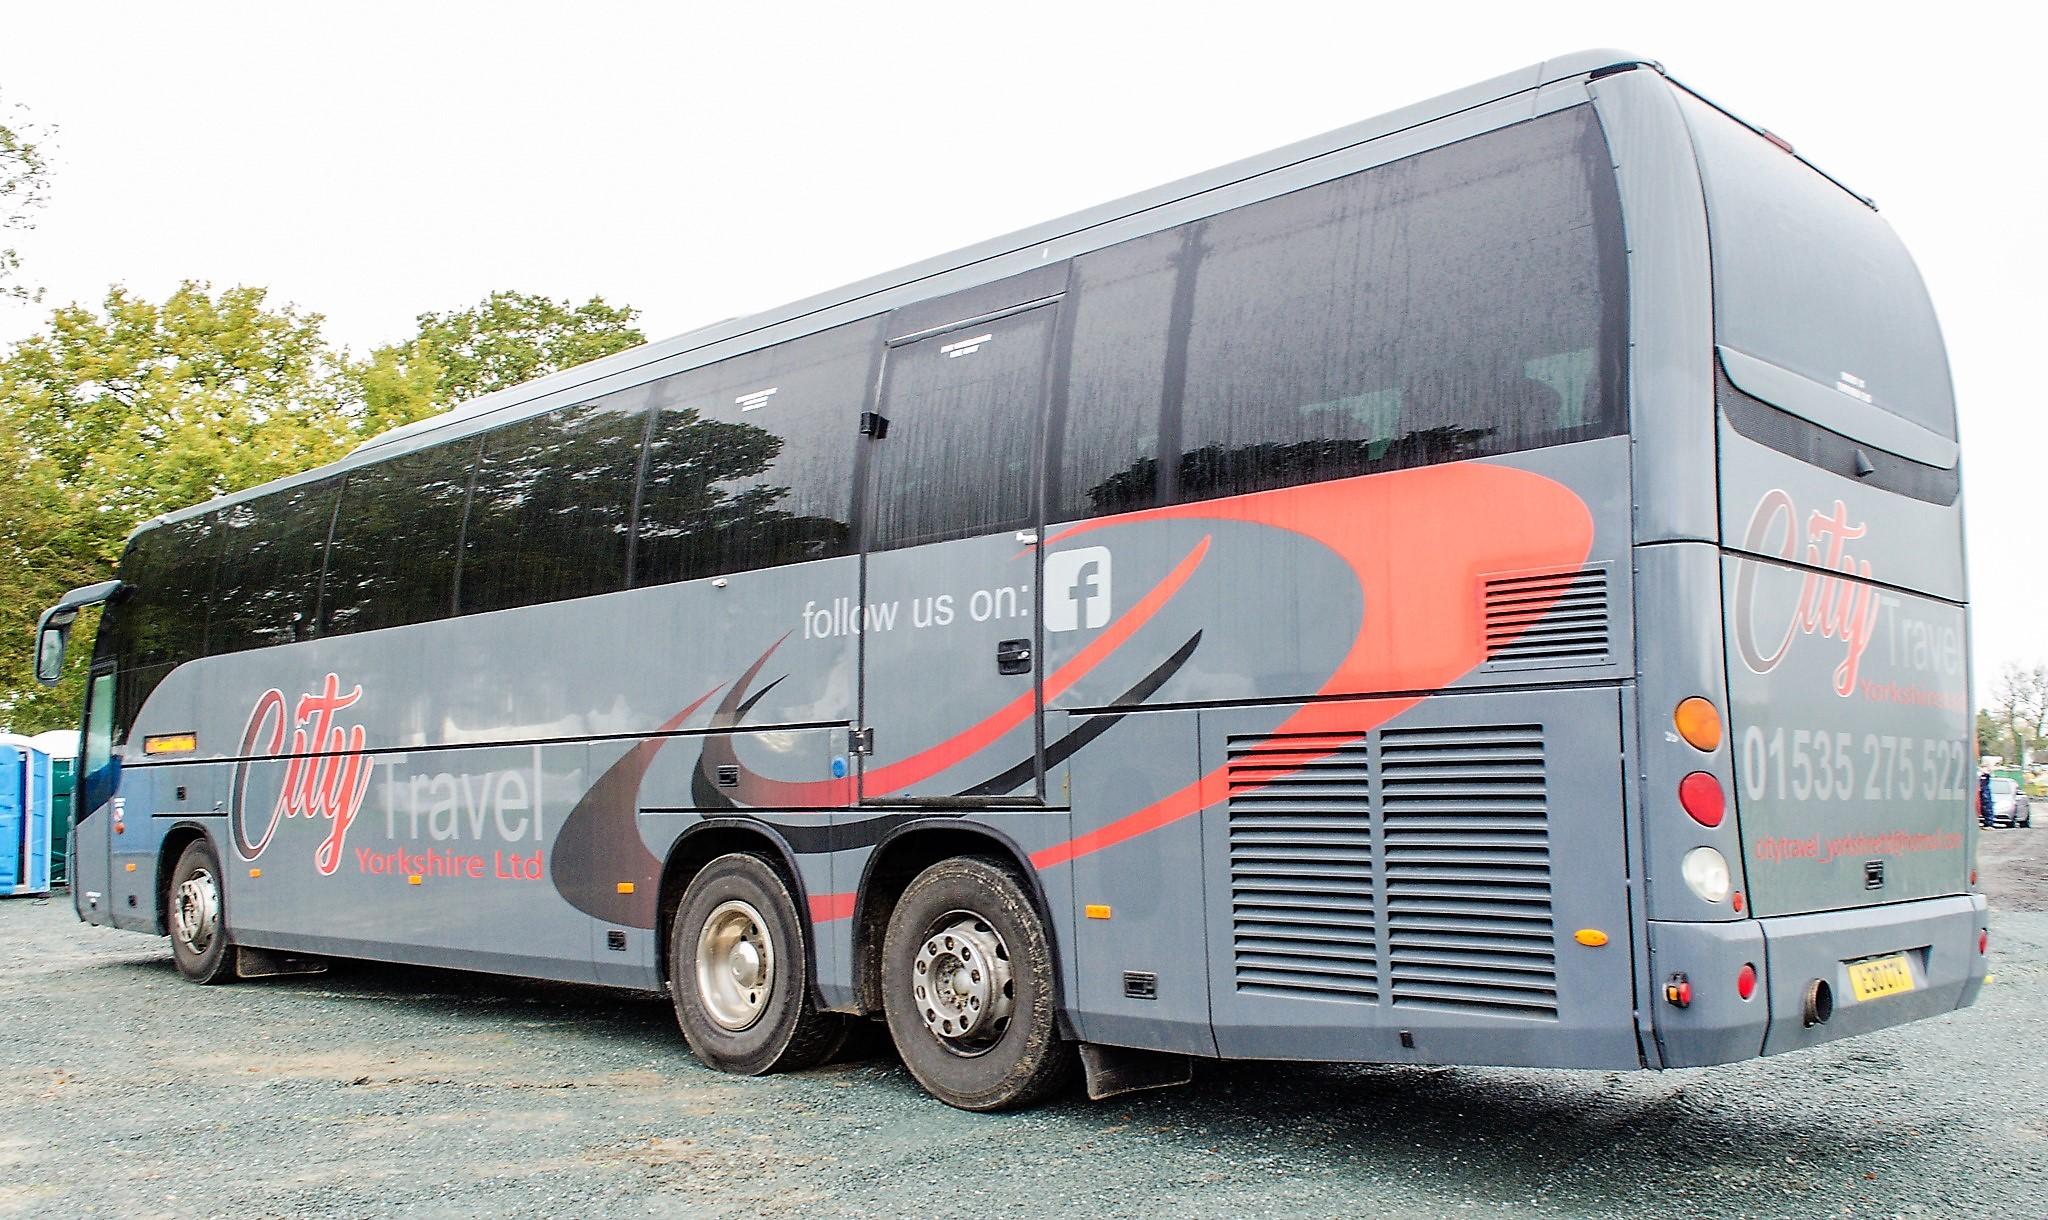 MAN F2000 Beulas Aura 54 seat luxury coach Registration Number: KC08 KTC Date of Registration: 30/ - Image 3 of 19